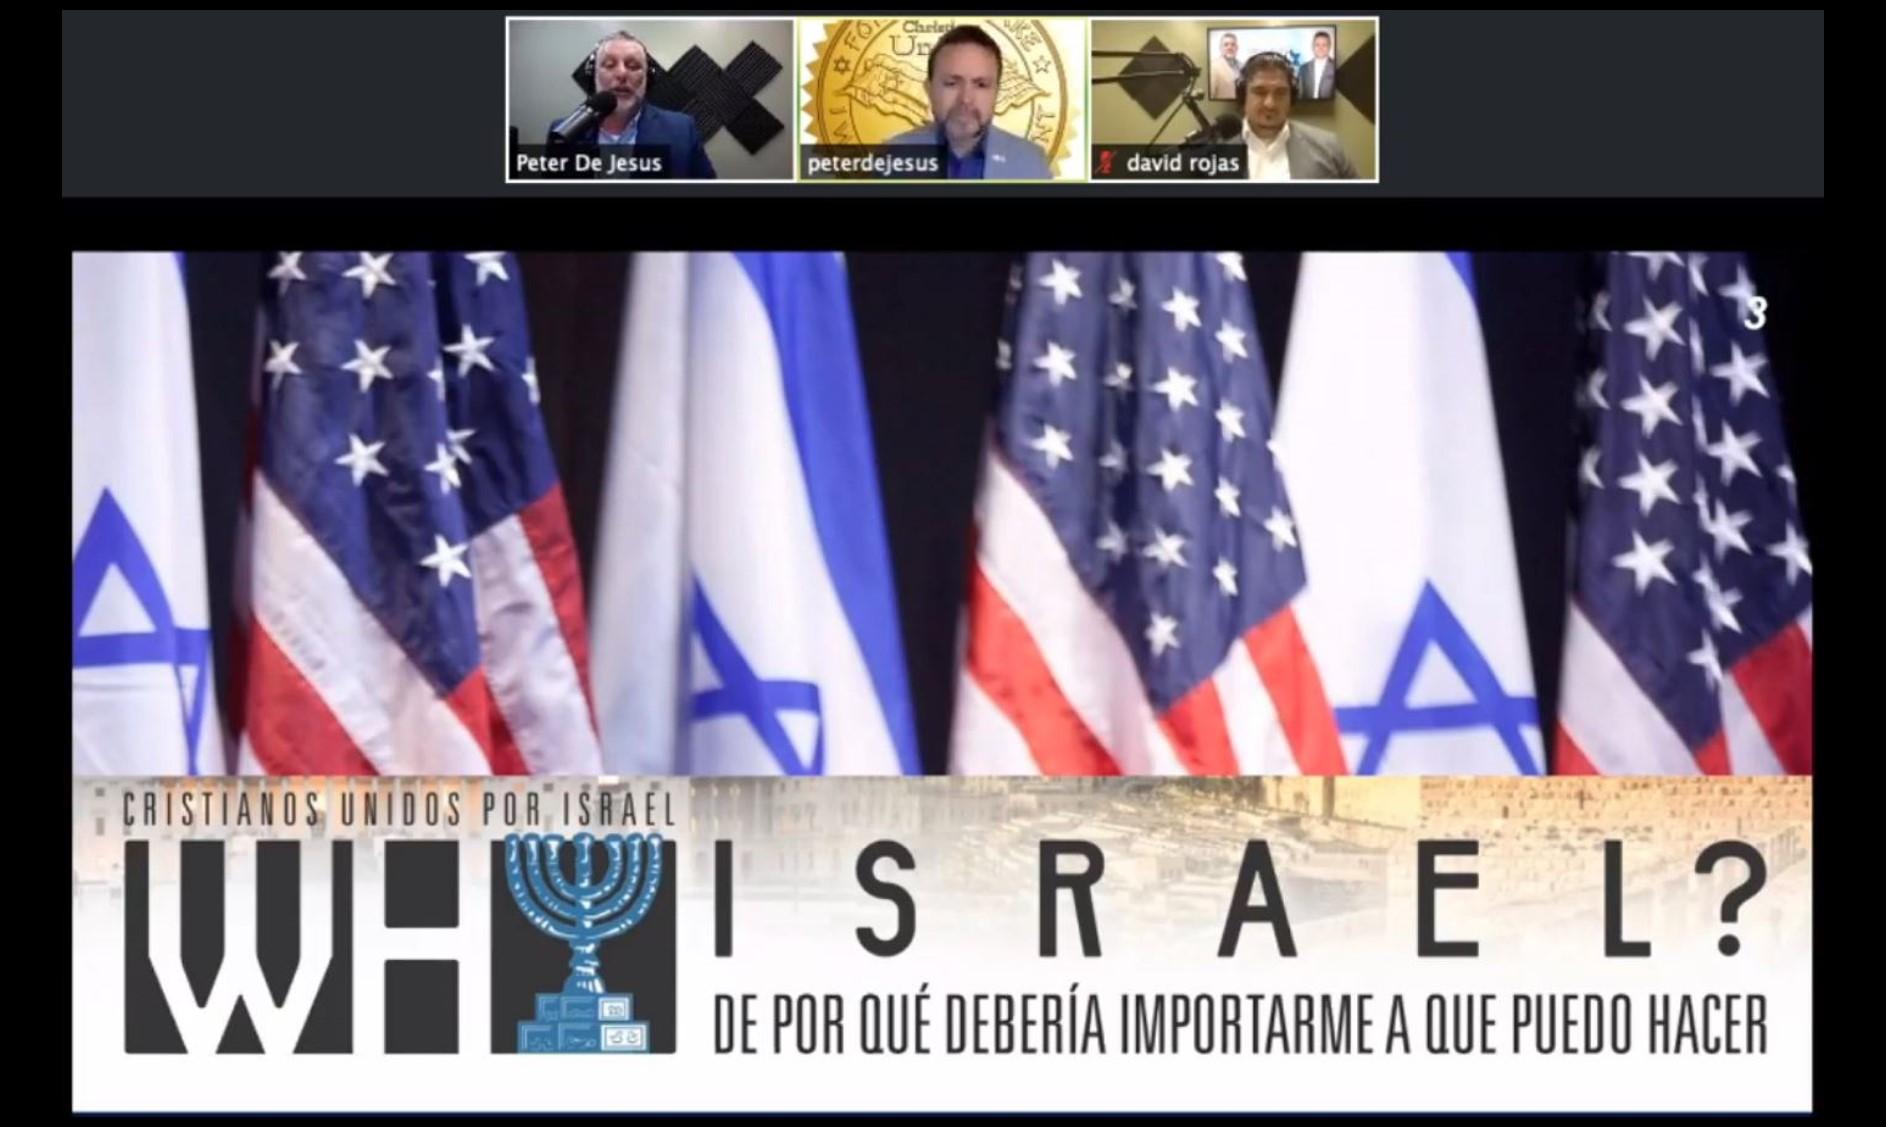 June 25 - Spanish Why Israel?